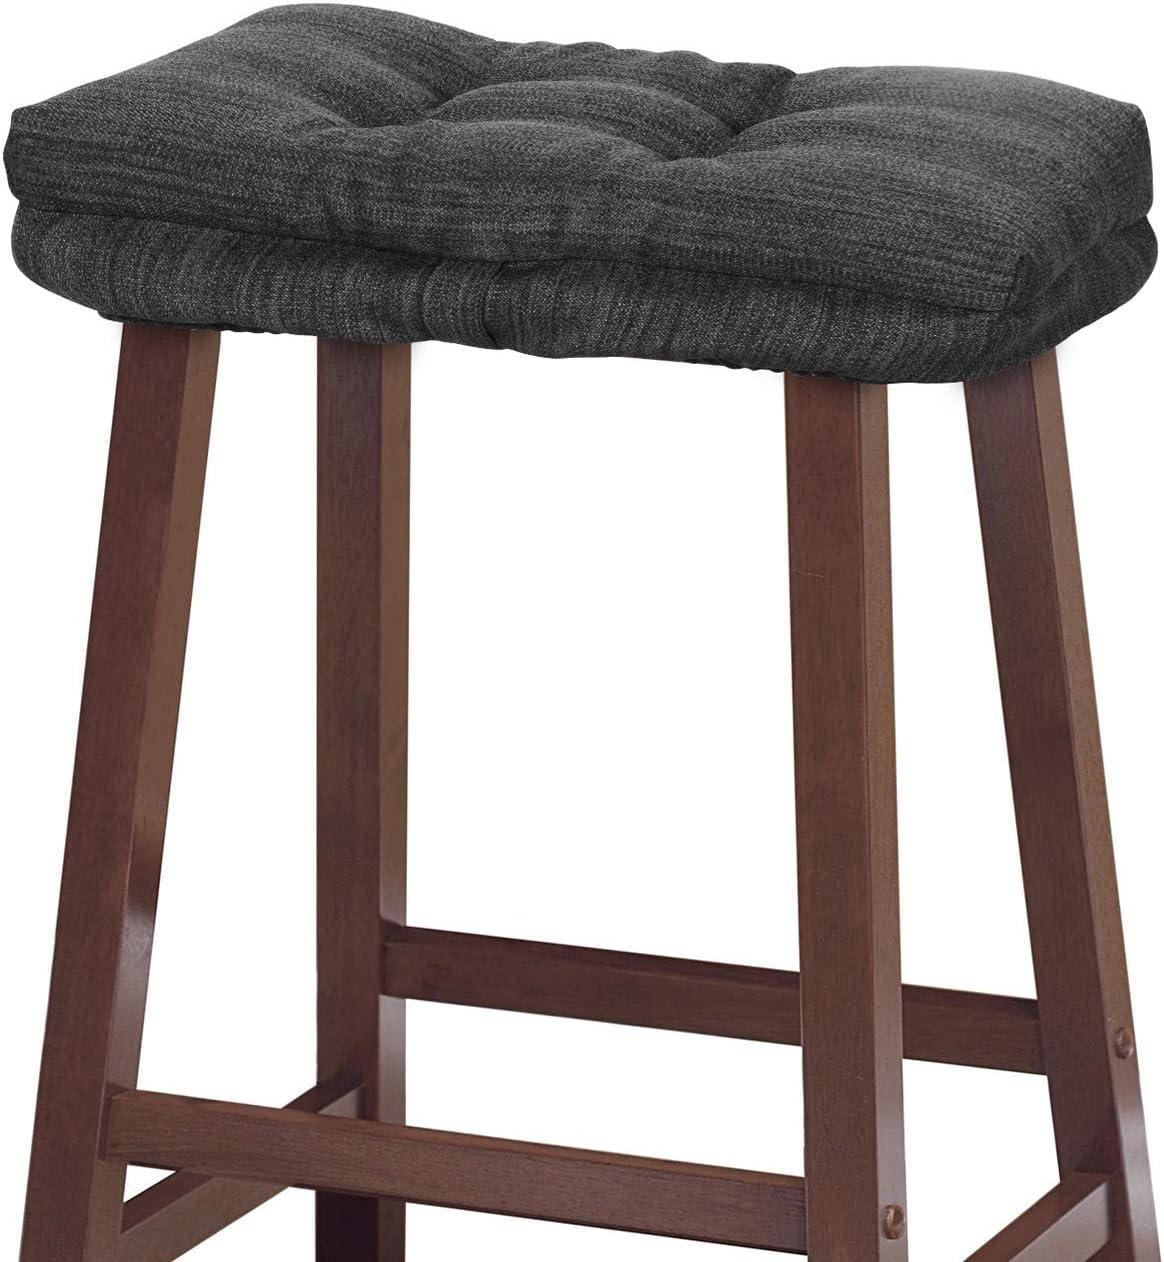 Amazon Com Baibu Stool Cushion Rectangular Super Soft Bar Stool Cushion Saddle Stool Seat Cushions With Ties One Pad Only Gray Black 18x9 5x1 5in Kitchen Dining